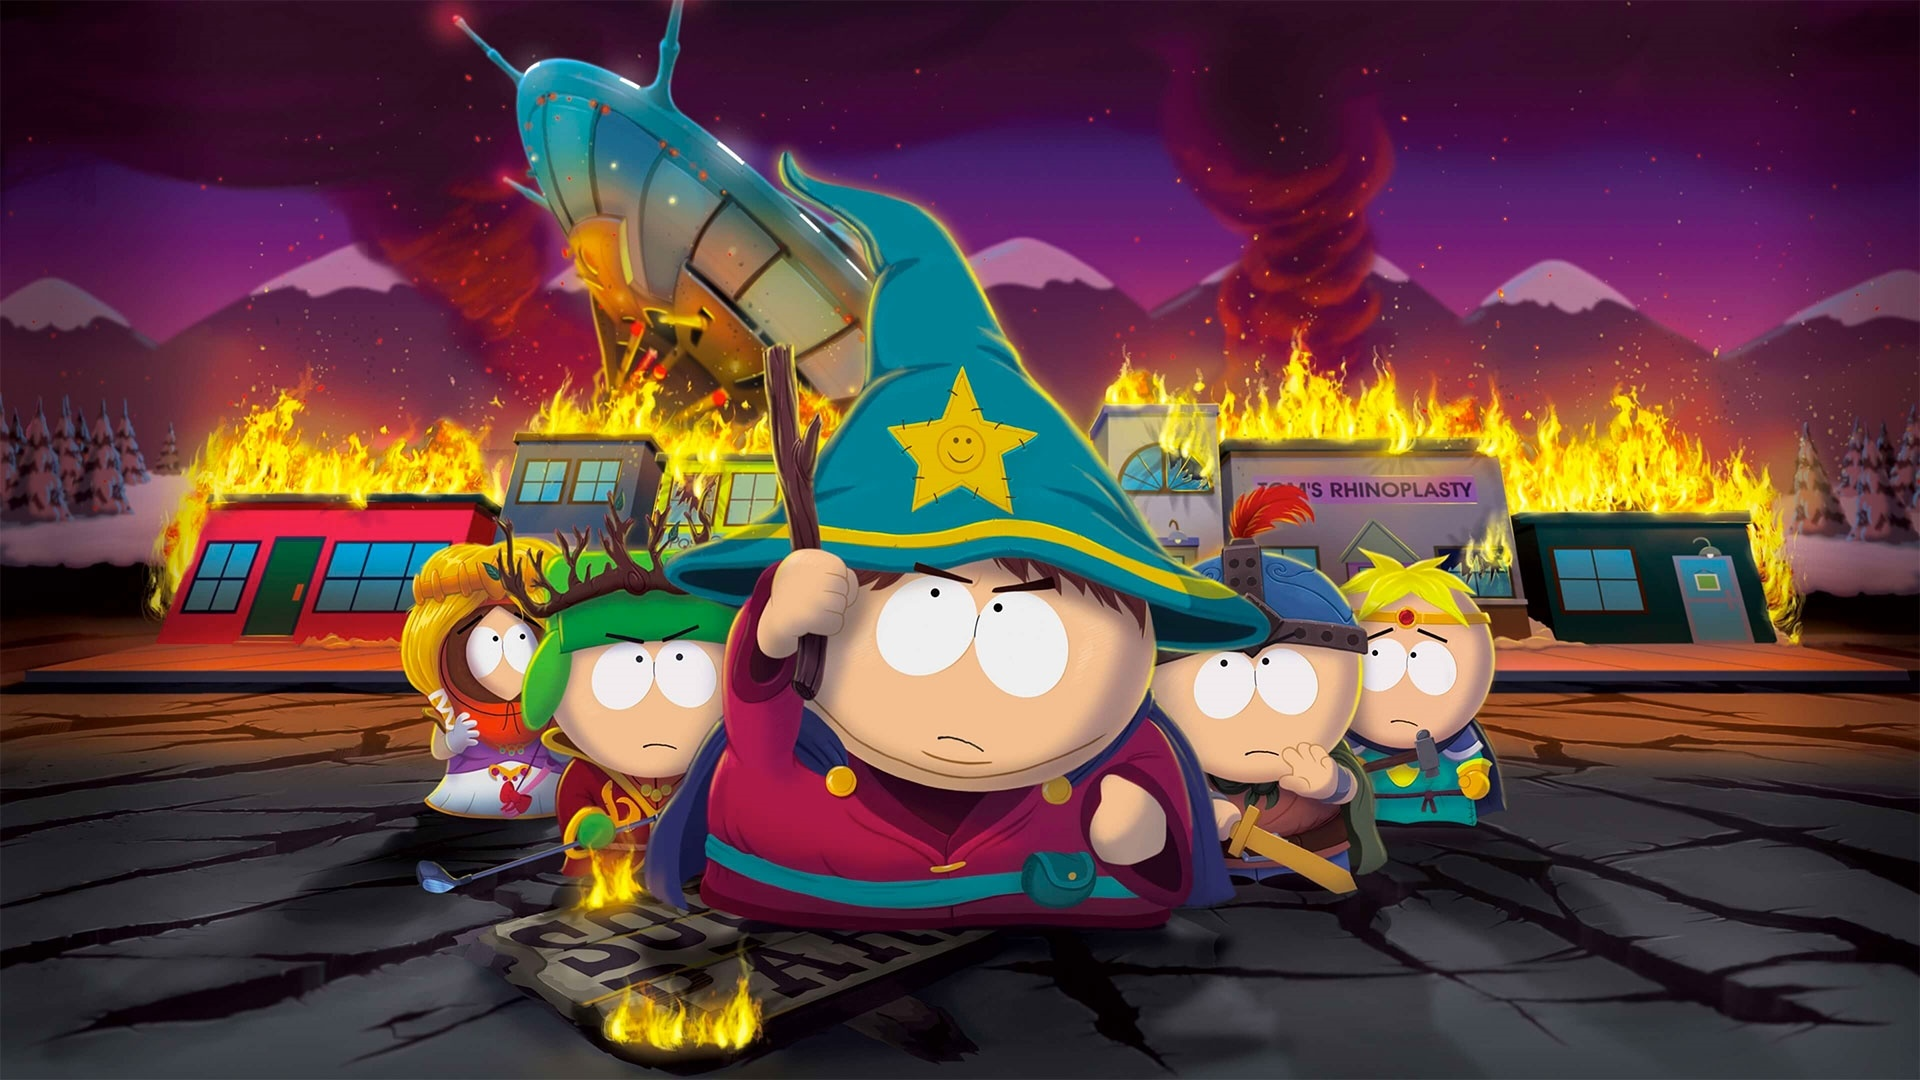 South Park best picture